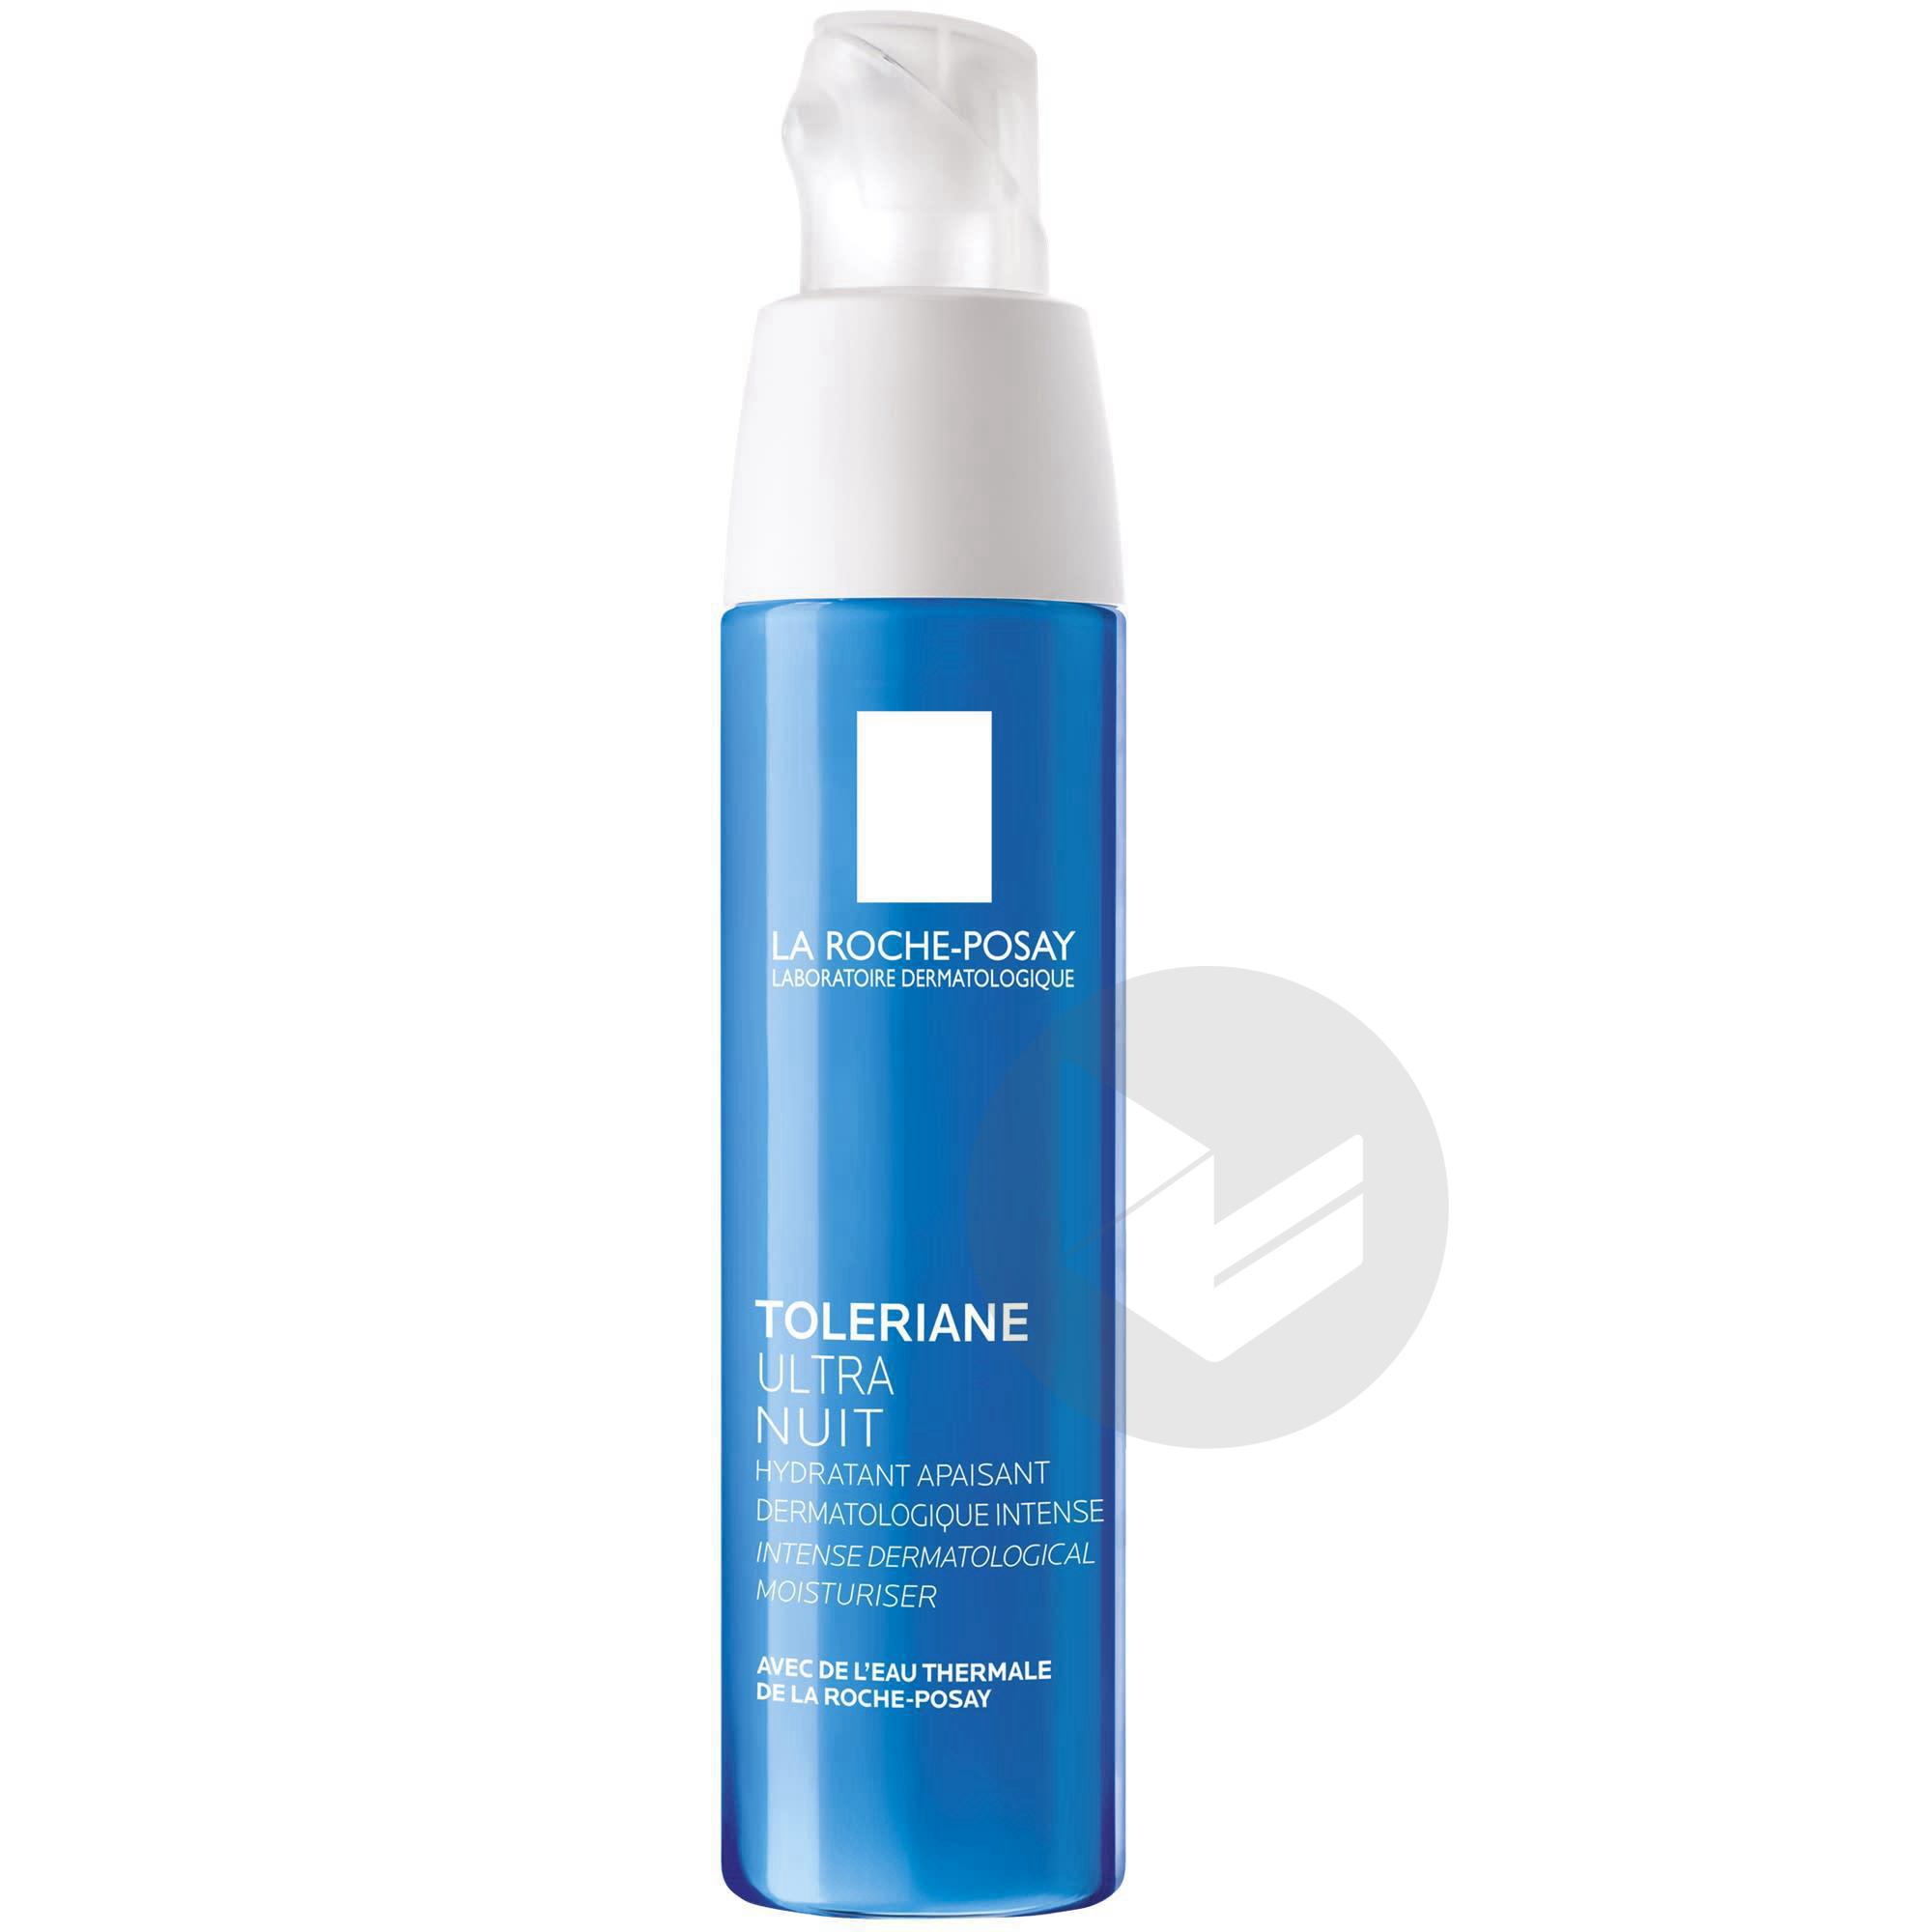 Toleriane Ultra Soin de nuit hydratant apaisant intense 40ml